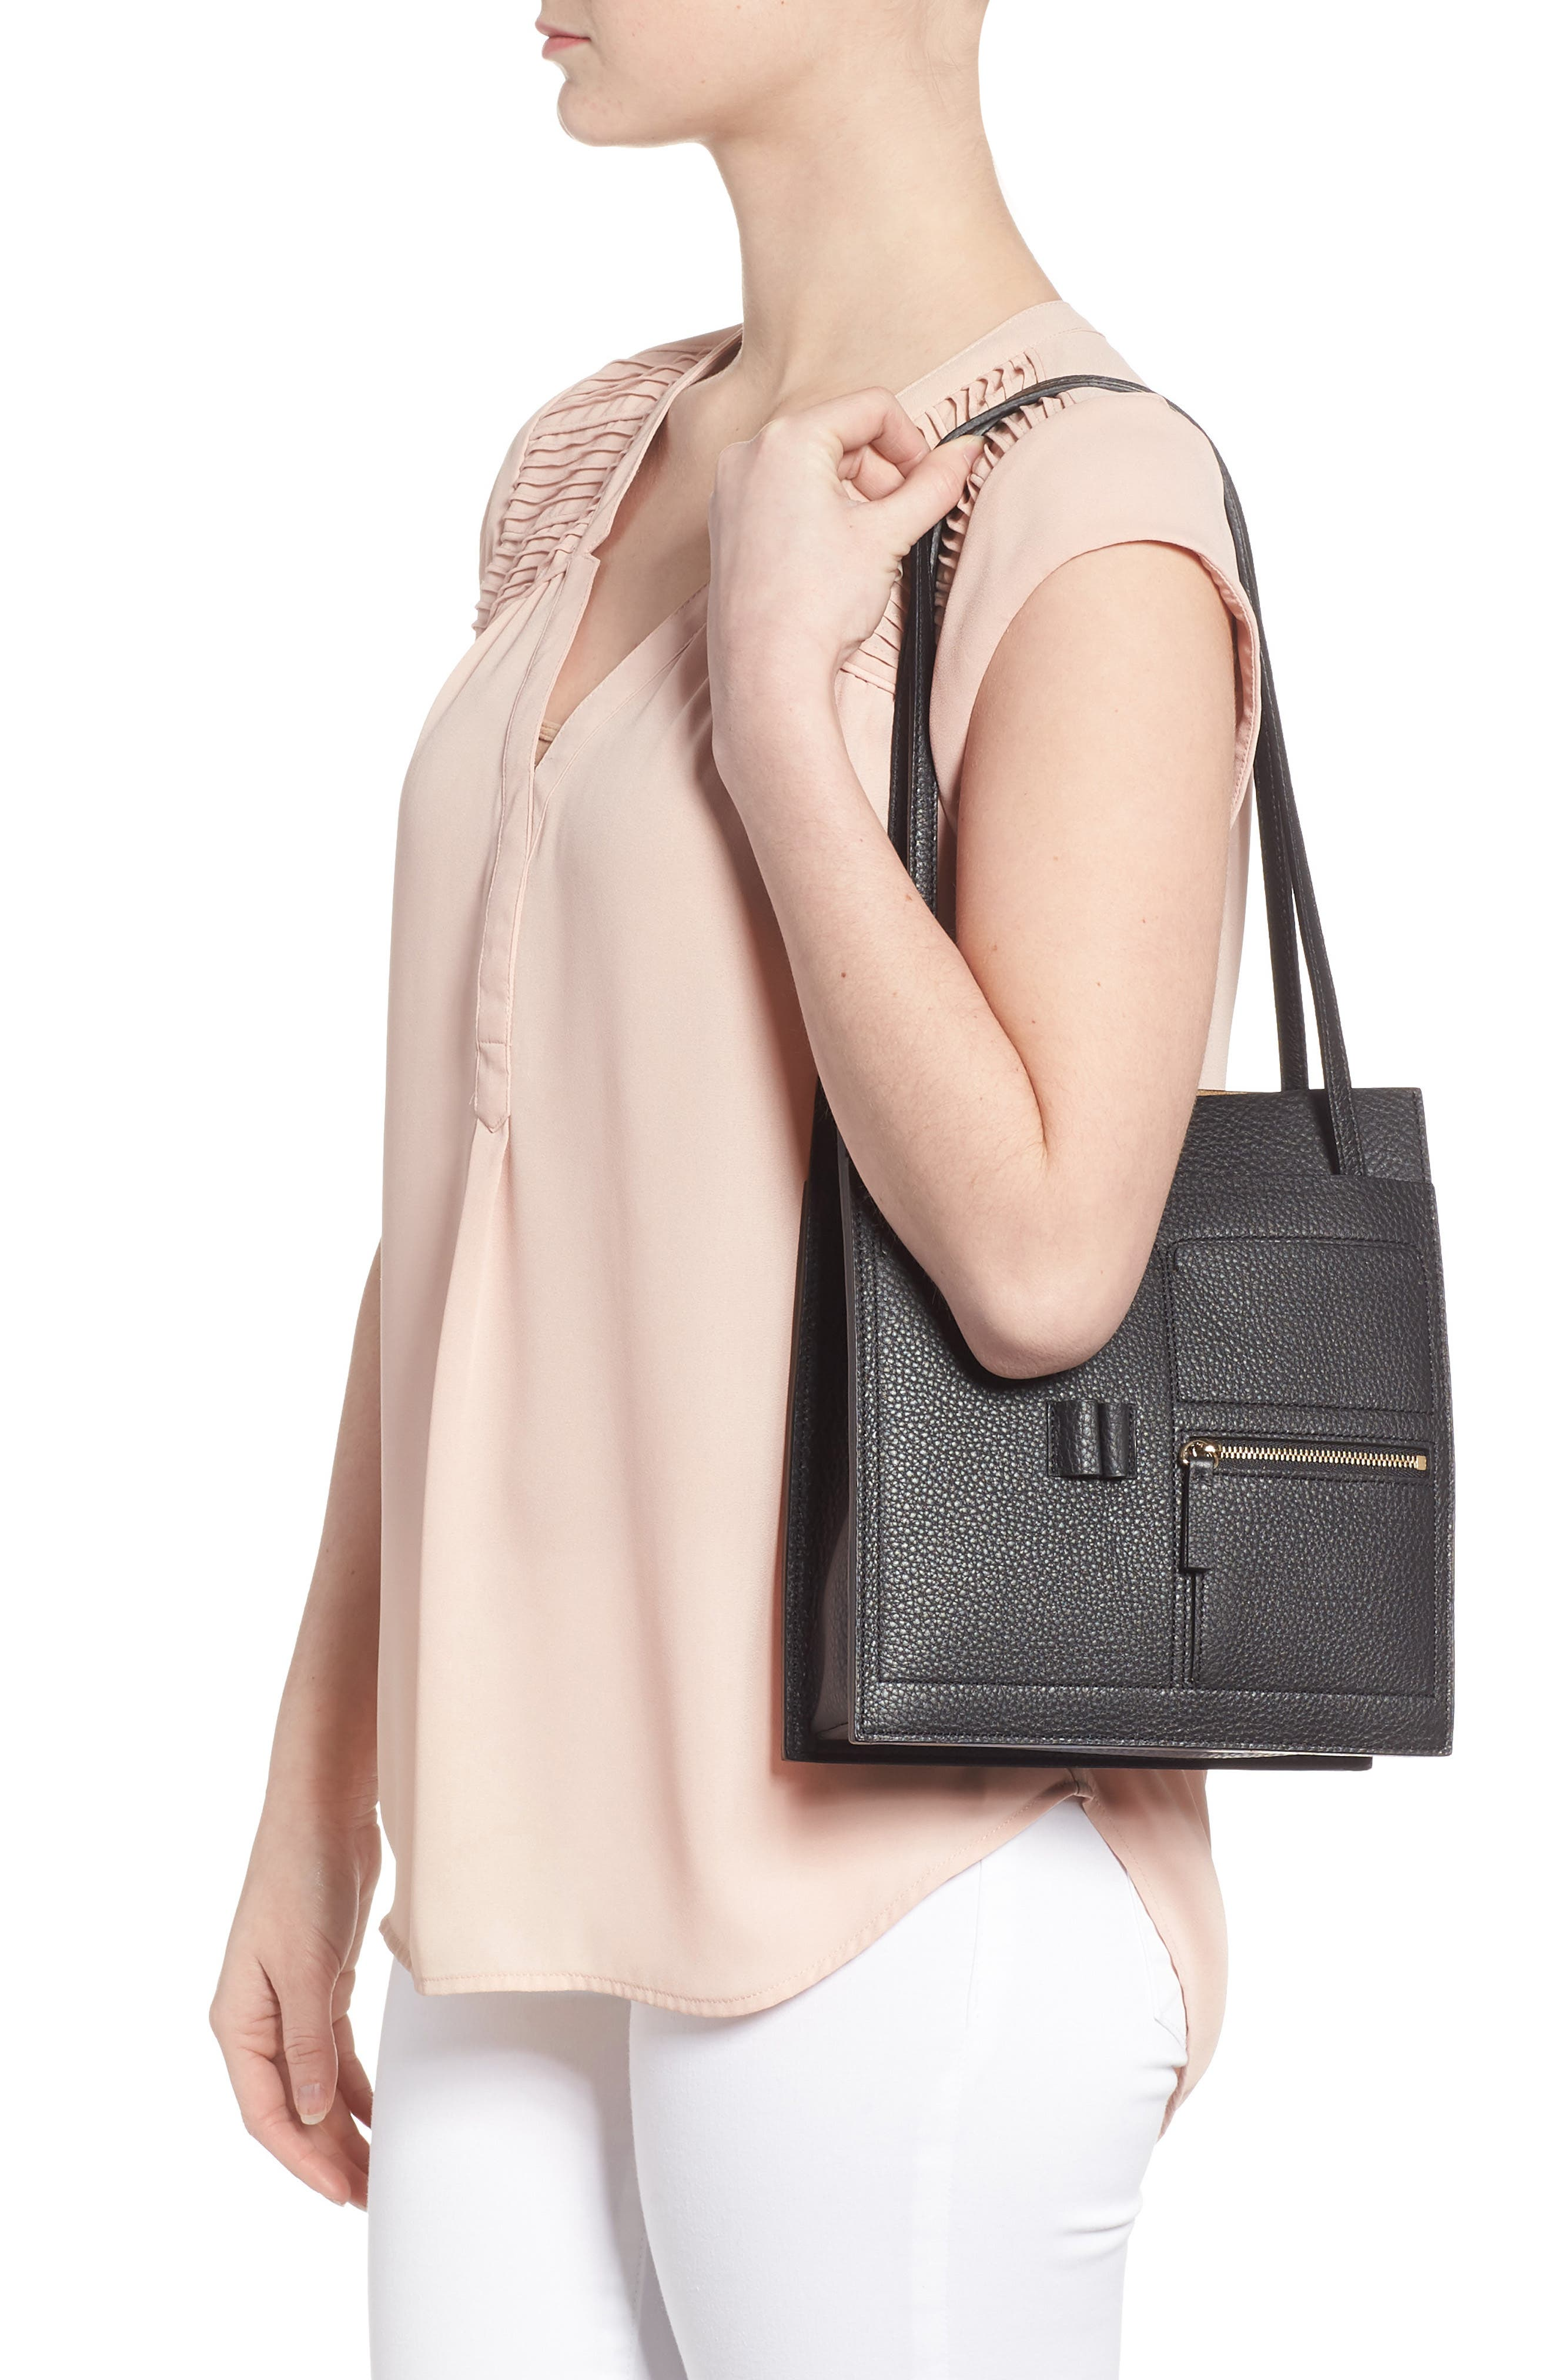 Kit Leather Convertible Shoulder Bag,                             Alternate thumbnail 2, color,                             TRUE BLACK